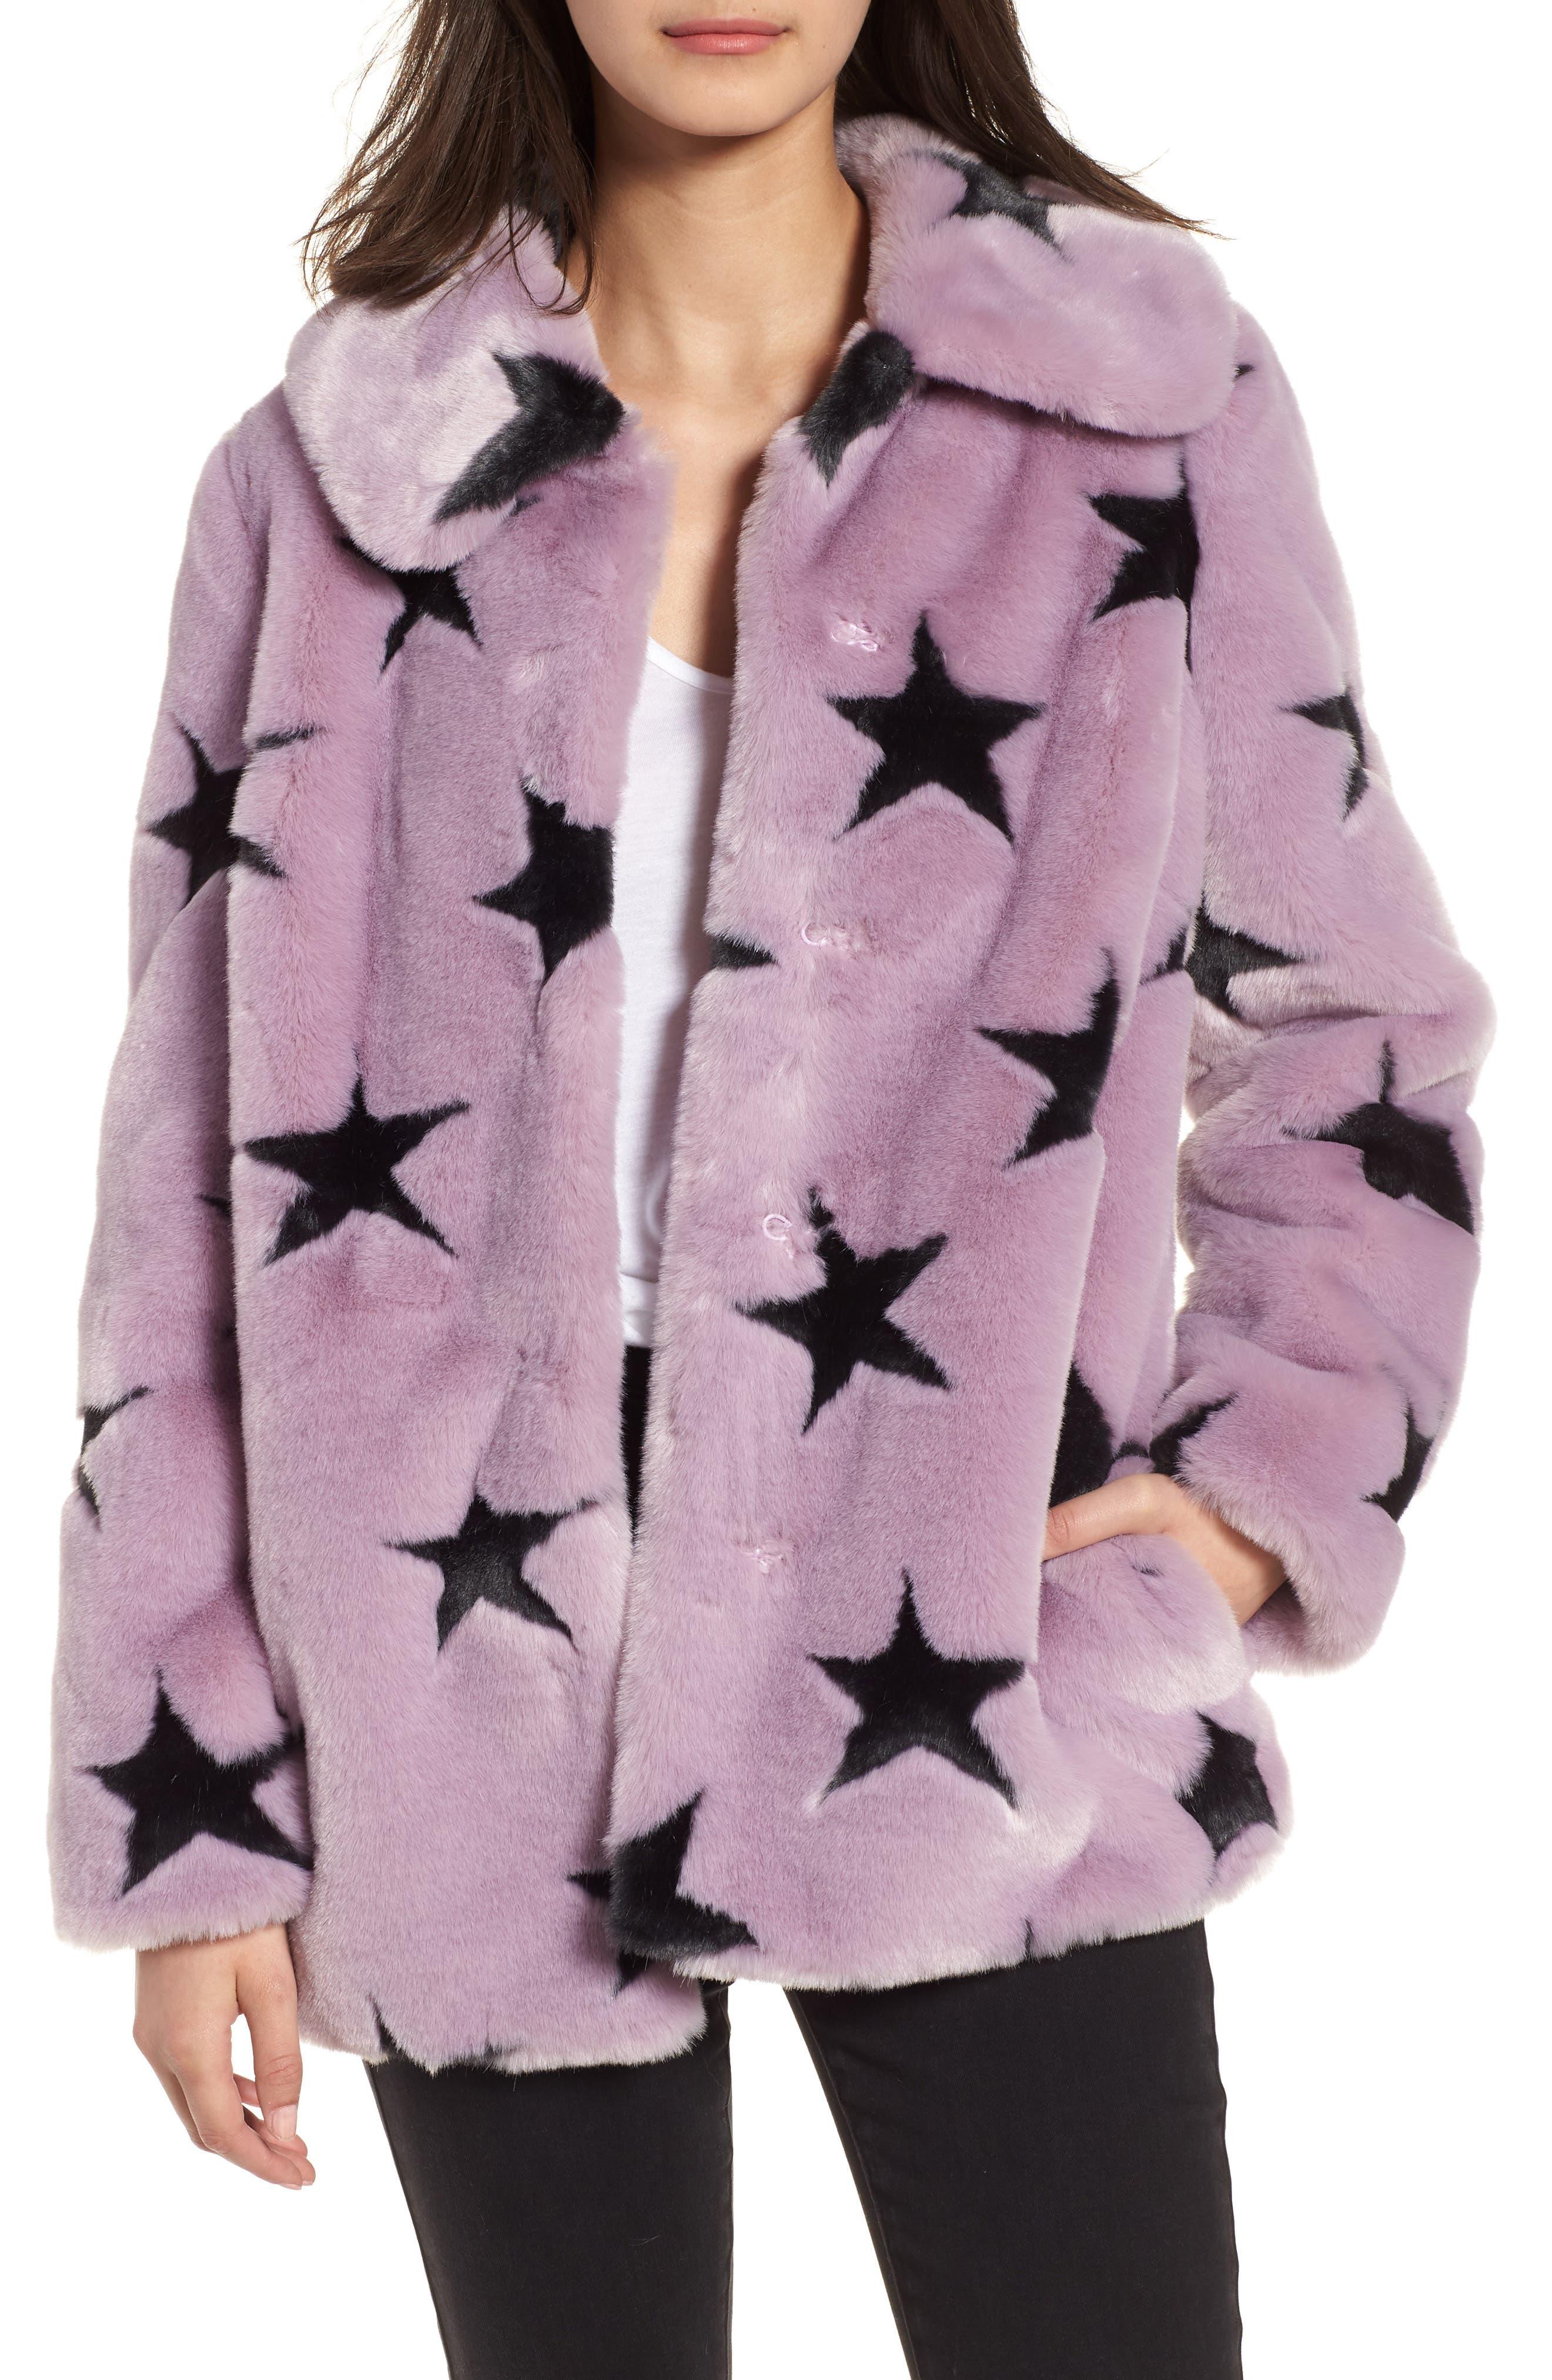 Faux Fur Swing Coat,                             Main thumbnail 1, color,                             Lavender/ Grey